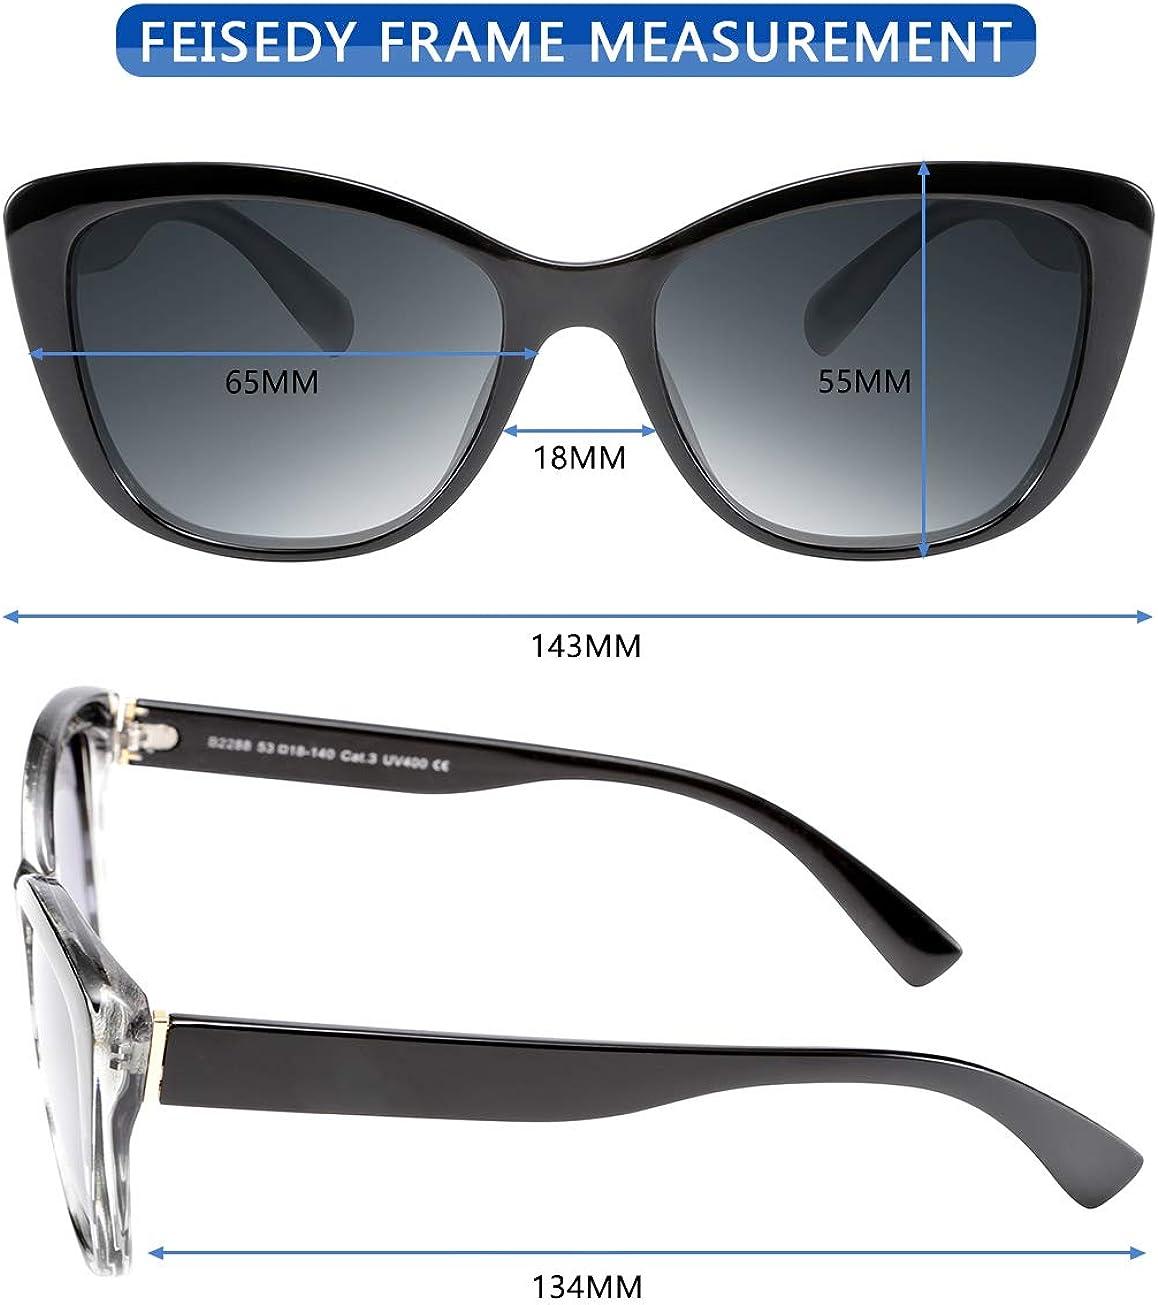 FEISEDY Polarized Vintage Sunglasses American Square Jackie O Cat Eye Sunglasses B2451